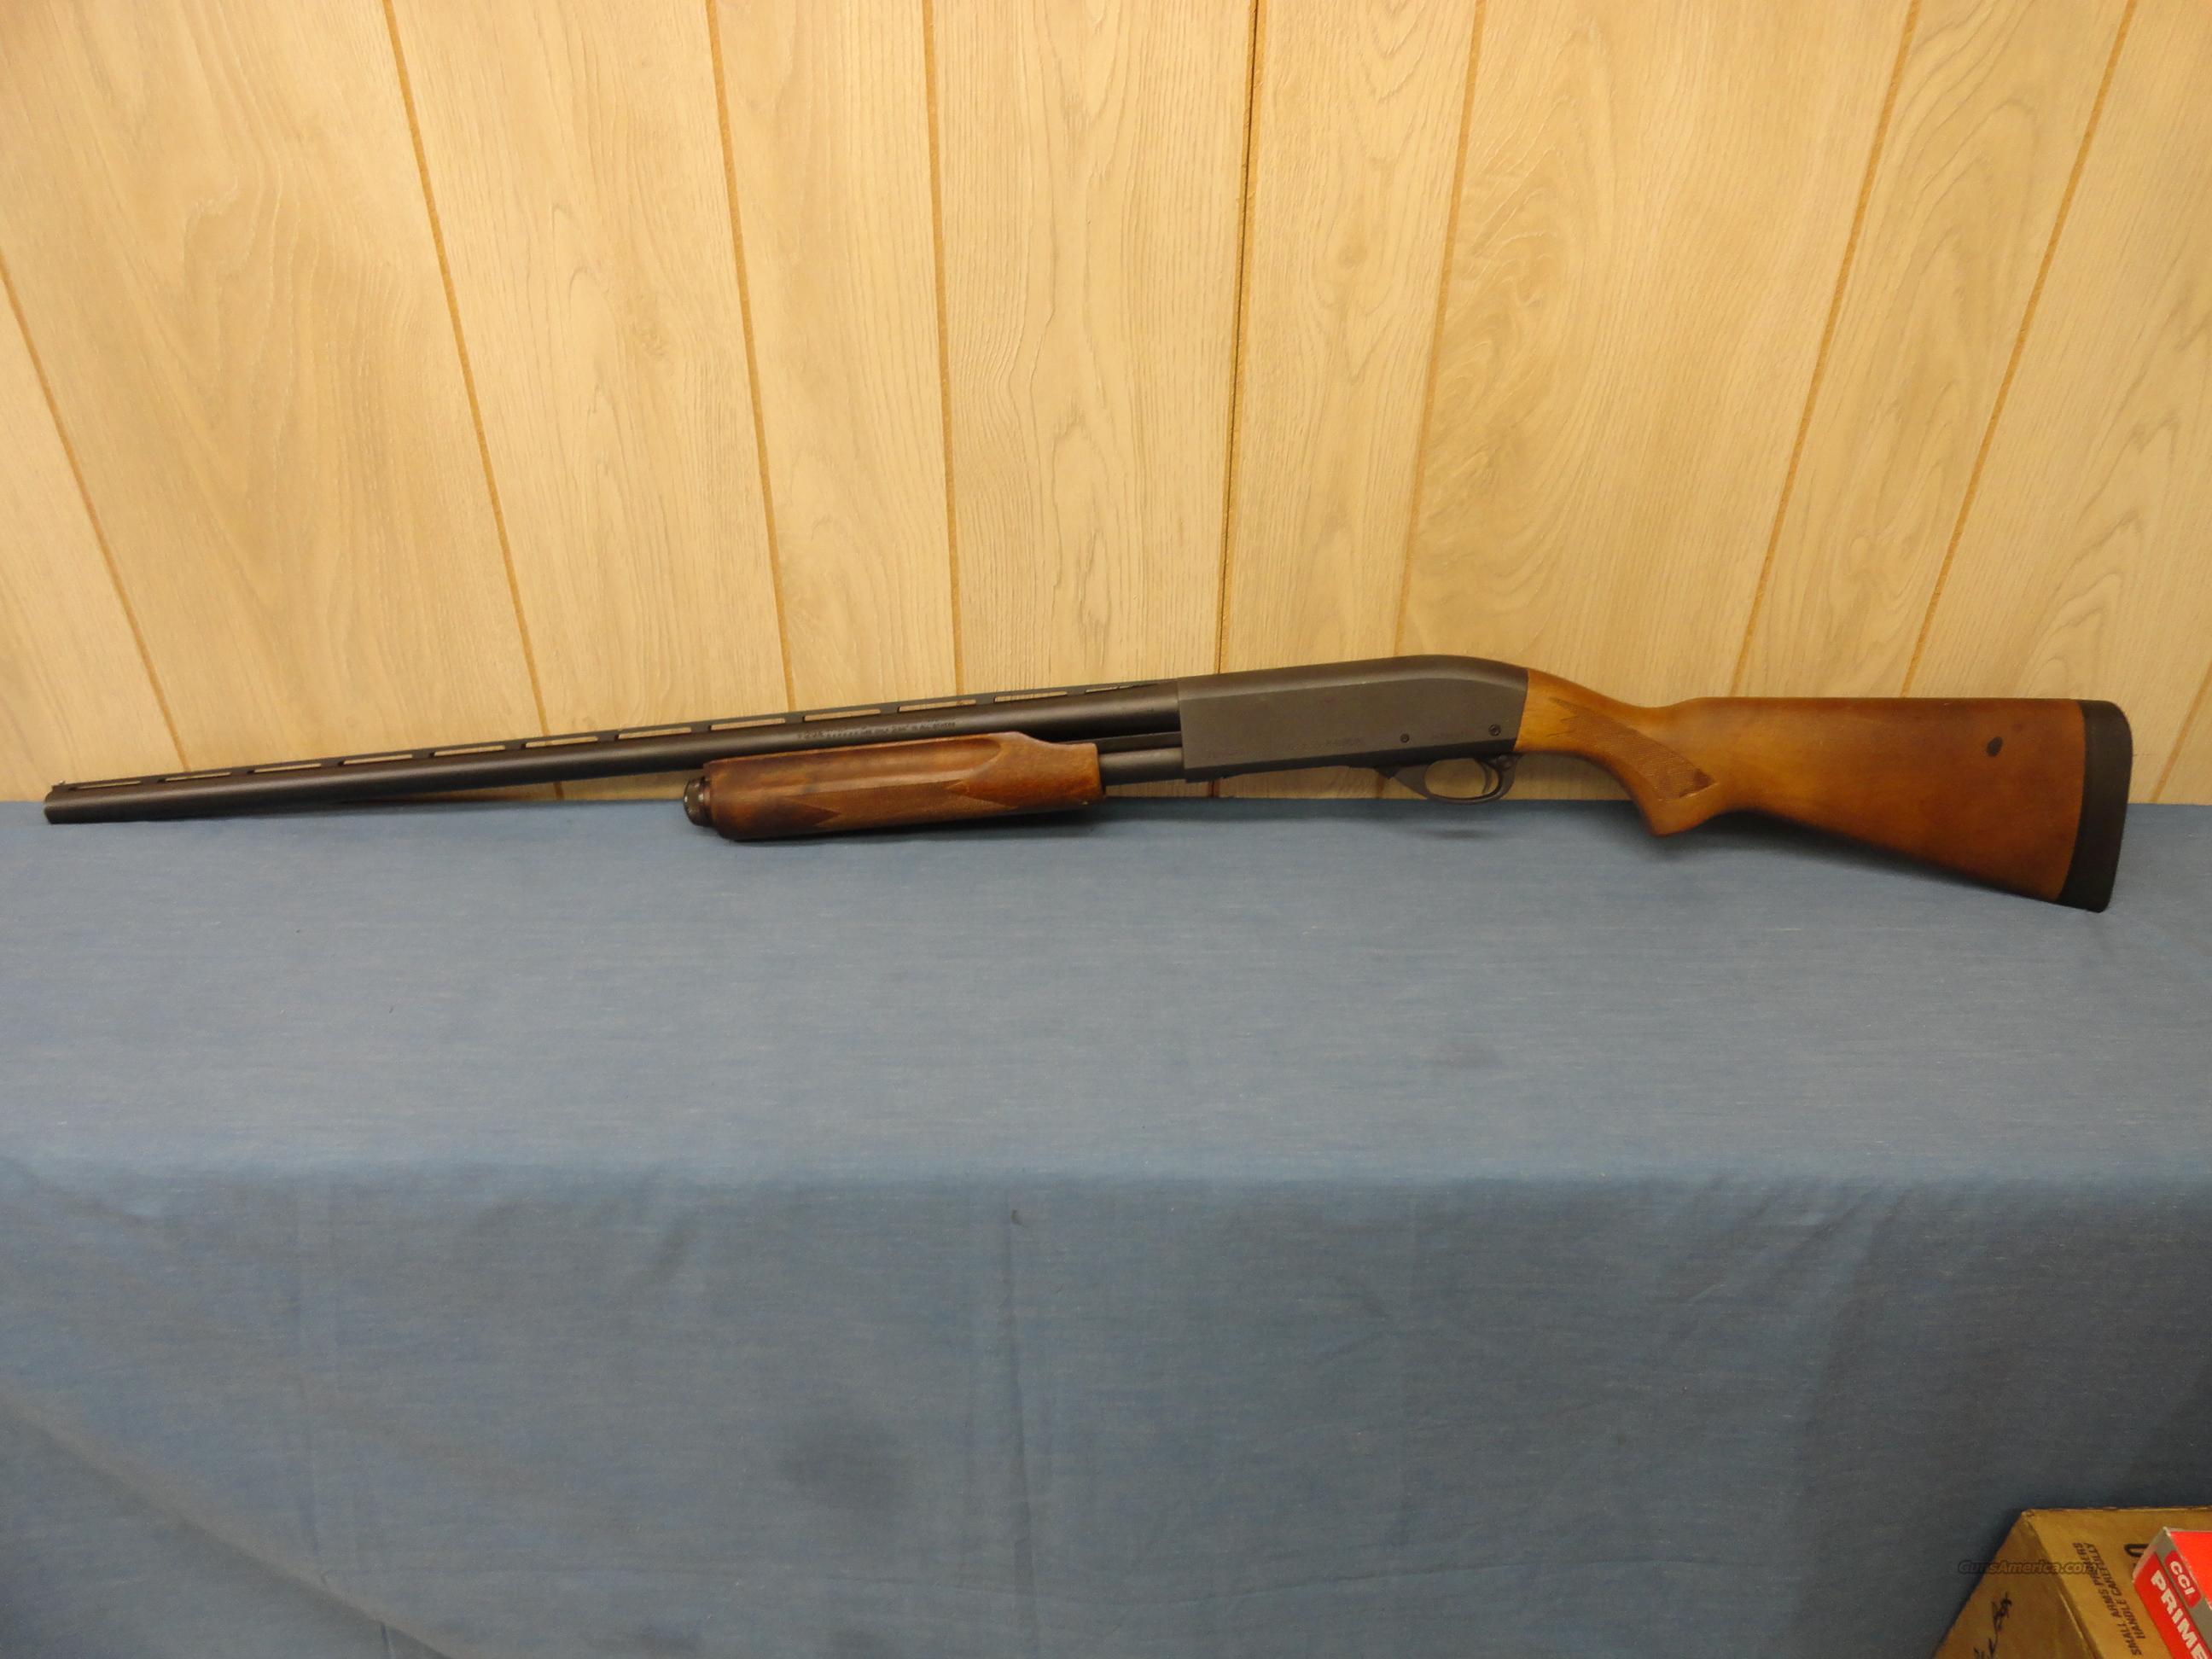 Remington 870 Express Magnum 12ga  Guns > Shotguns > Remington Shotguns  > Pump > Hunting